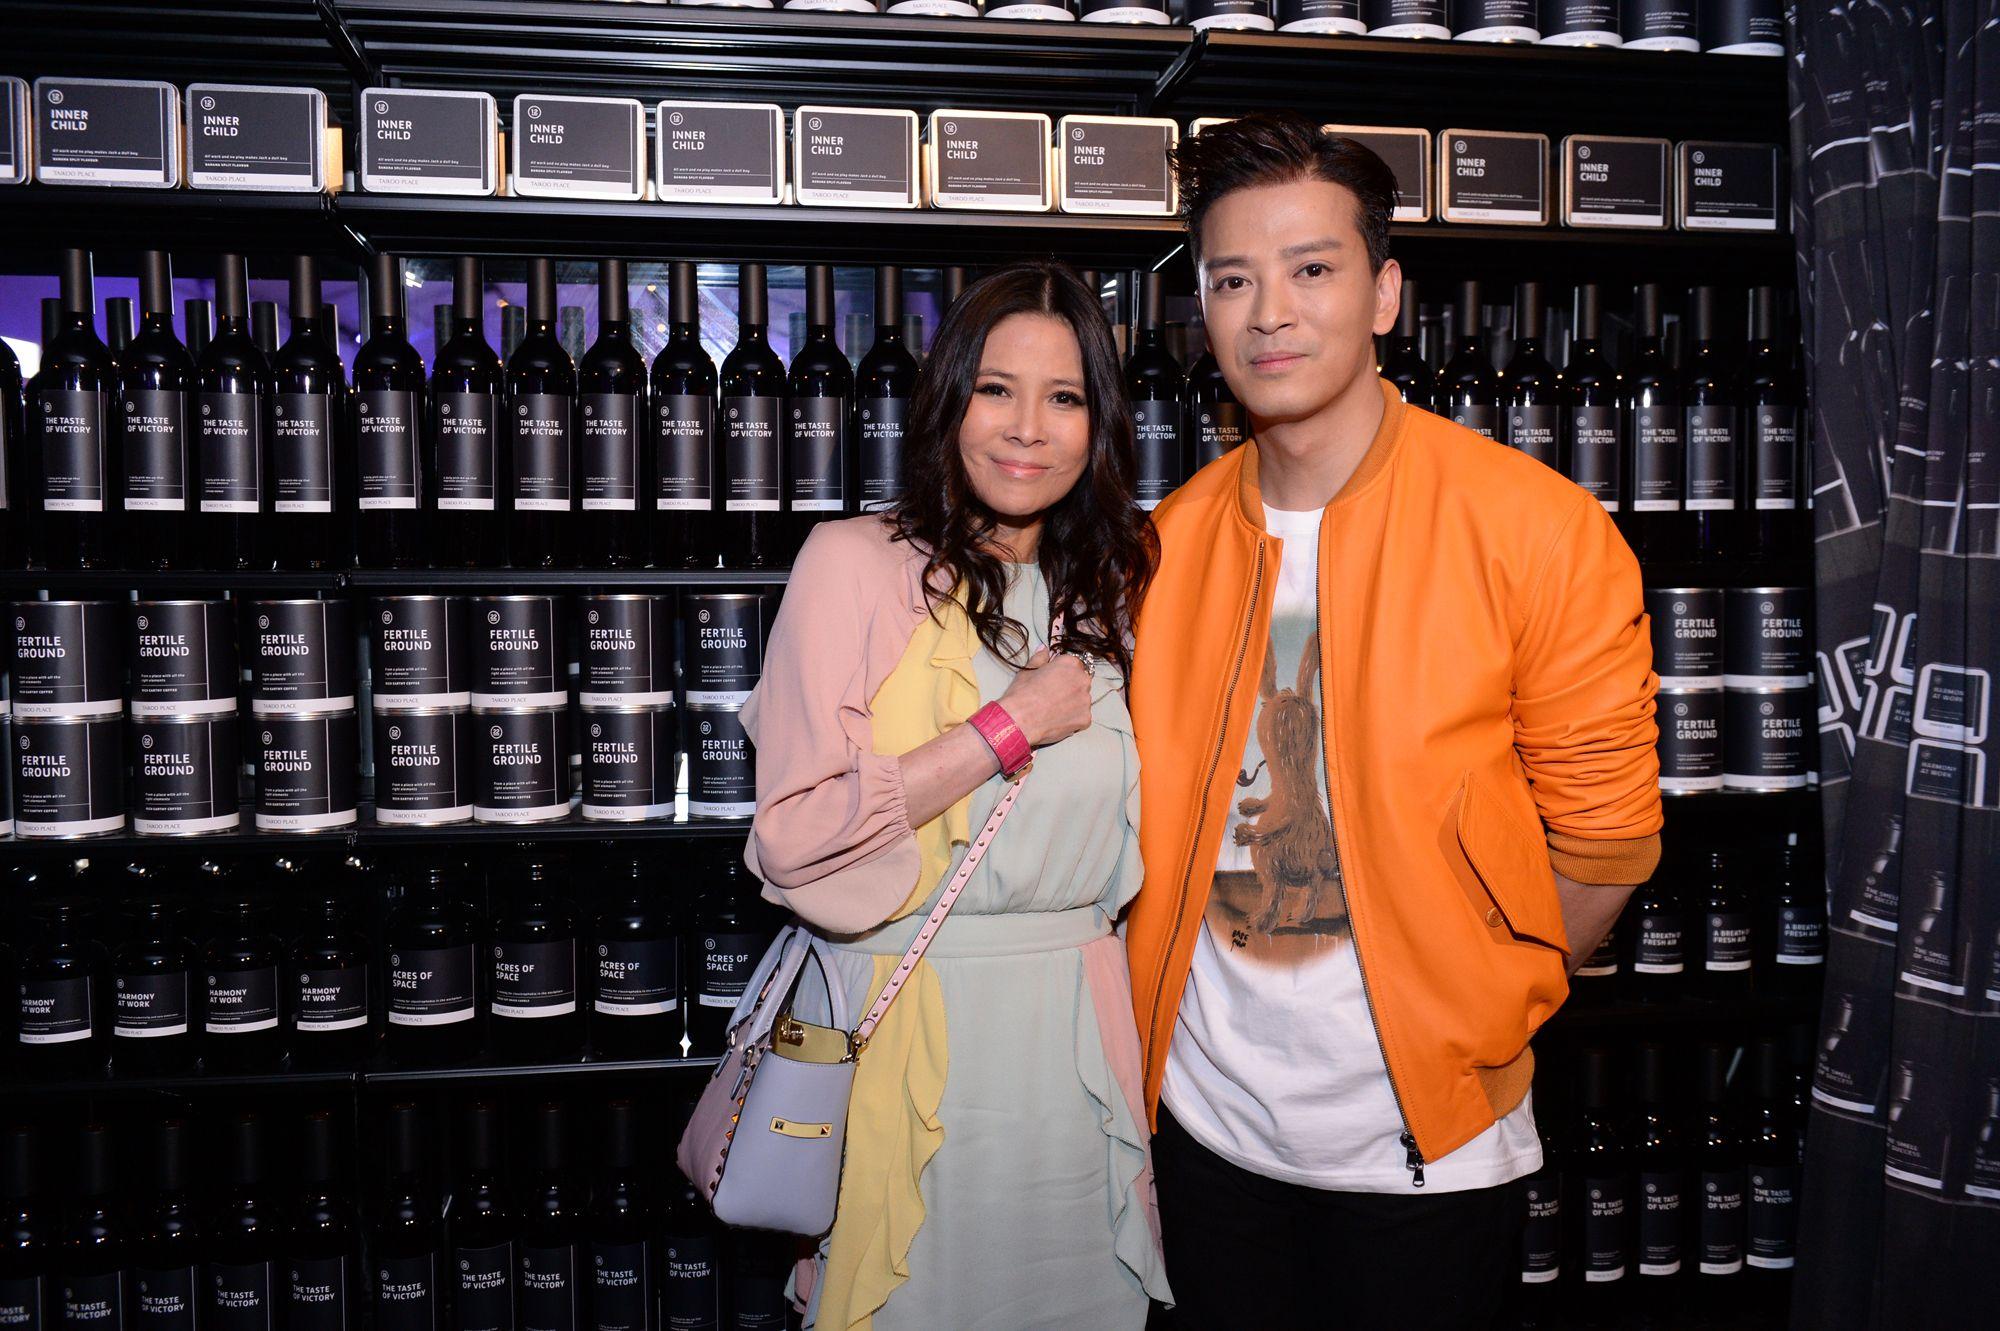 Yvette Yung and Daniel Chan